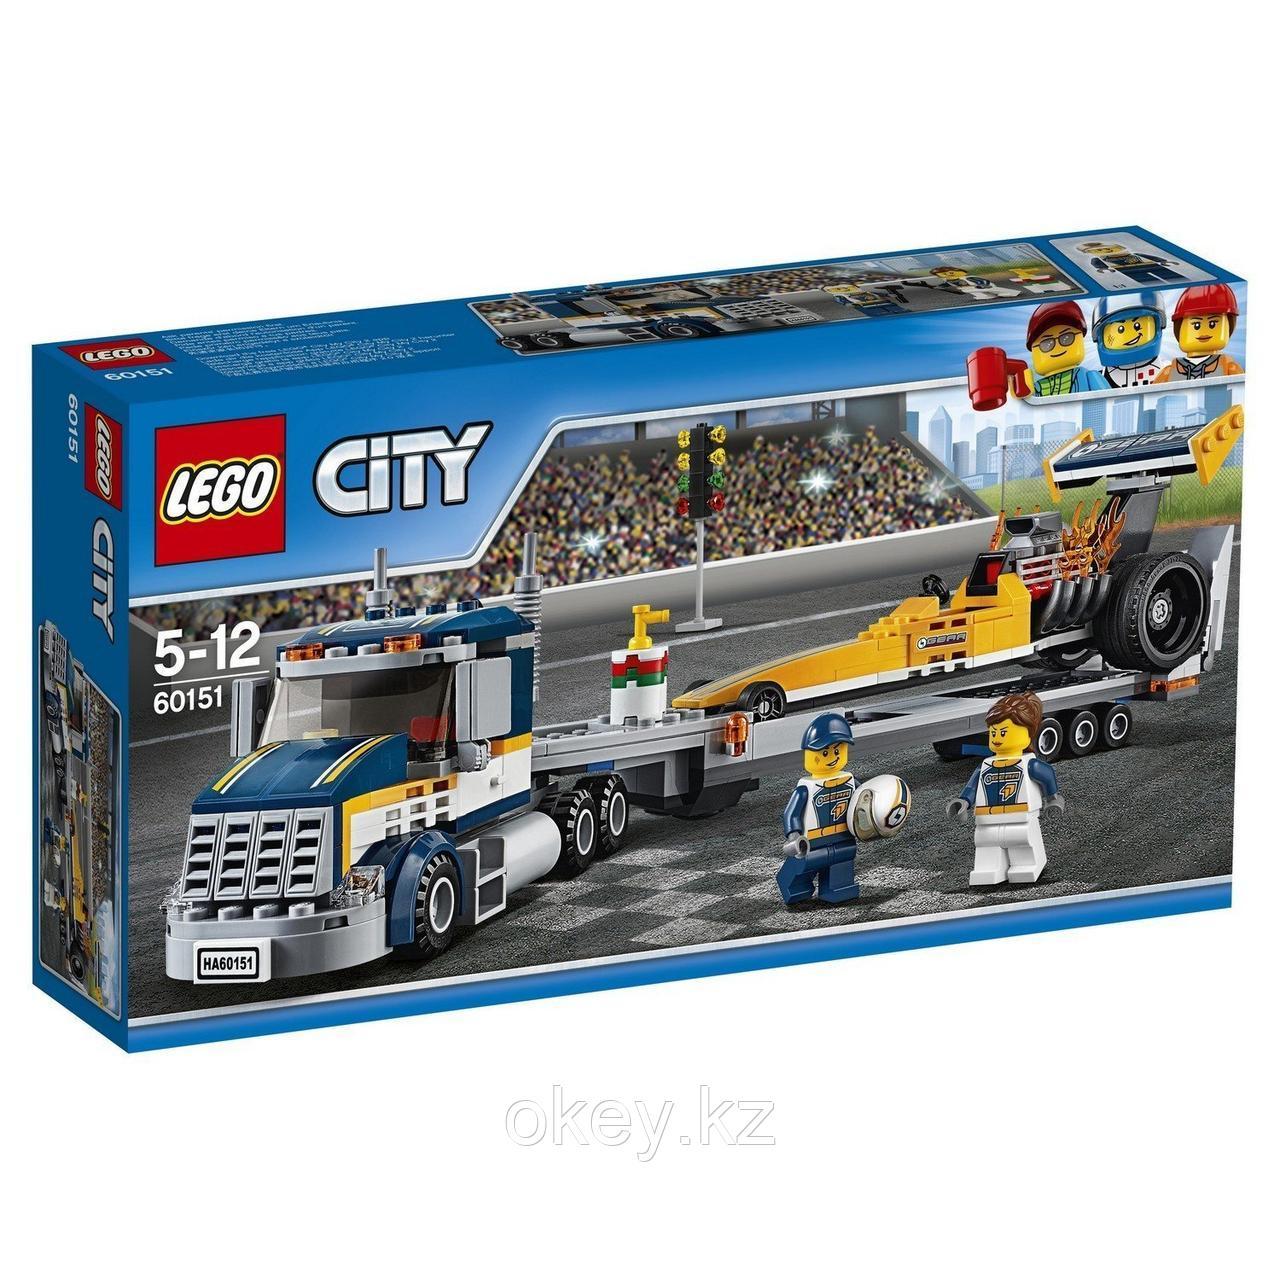 LEGO City: Грузовик для перевозки драгстера 60151